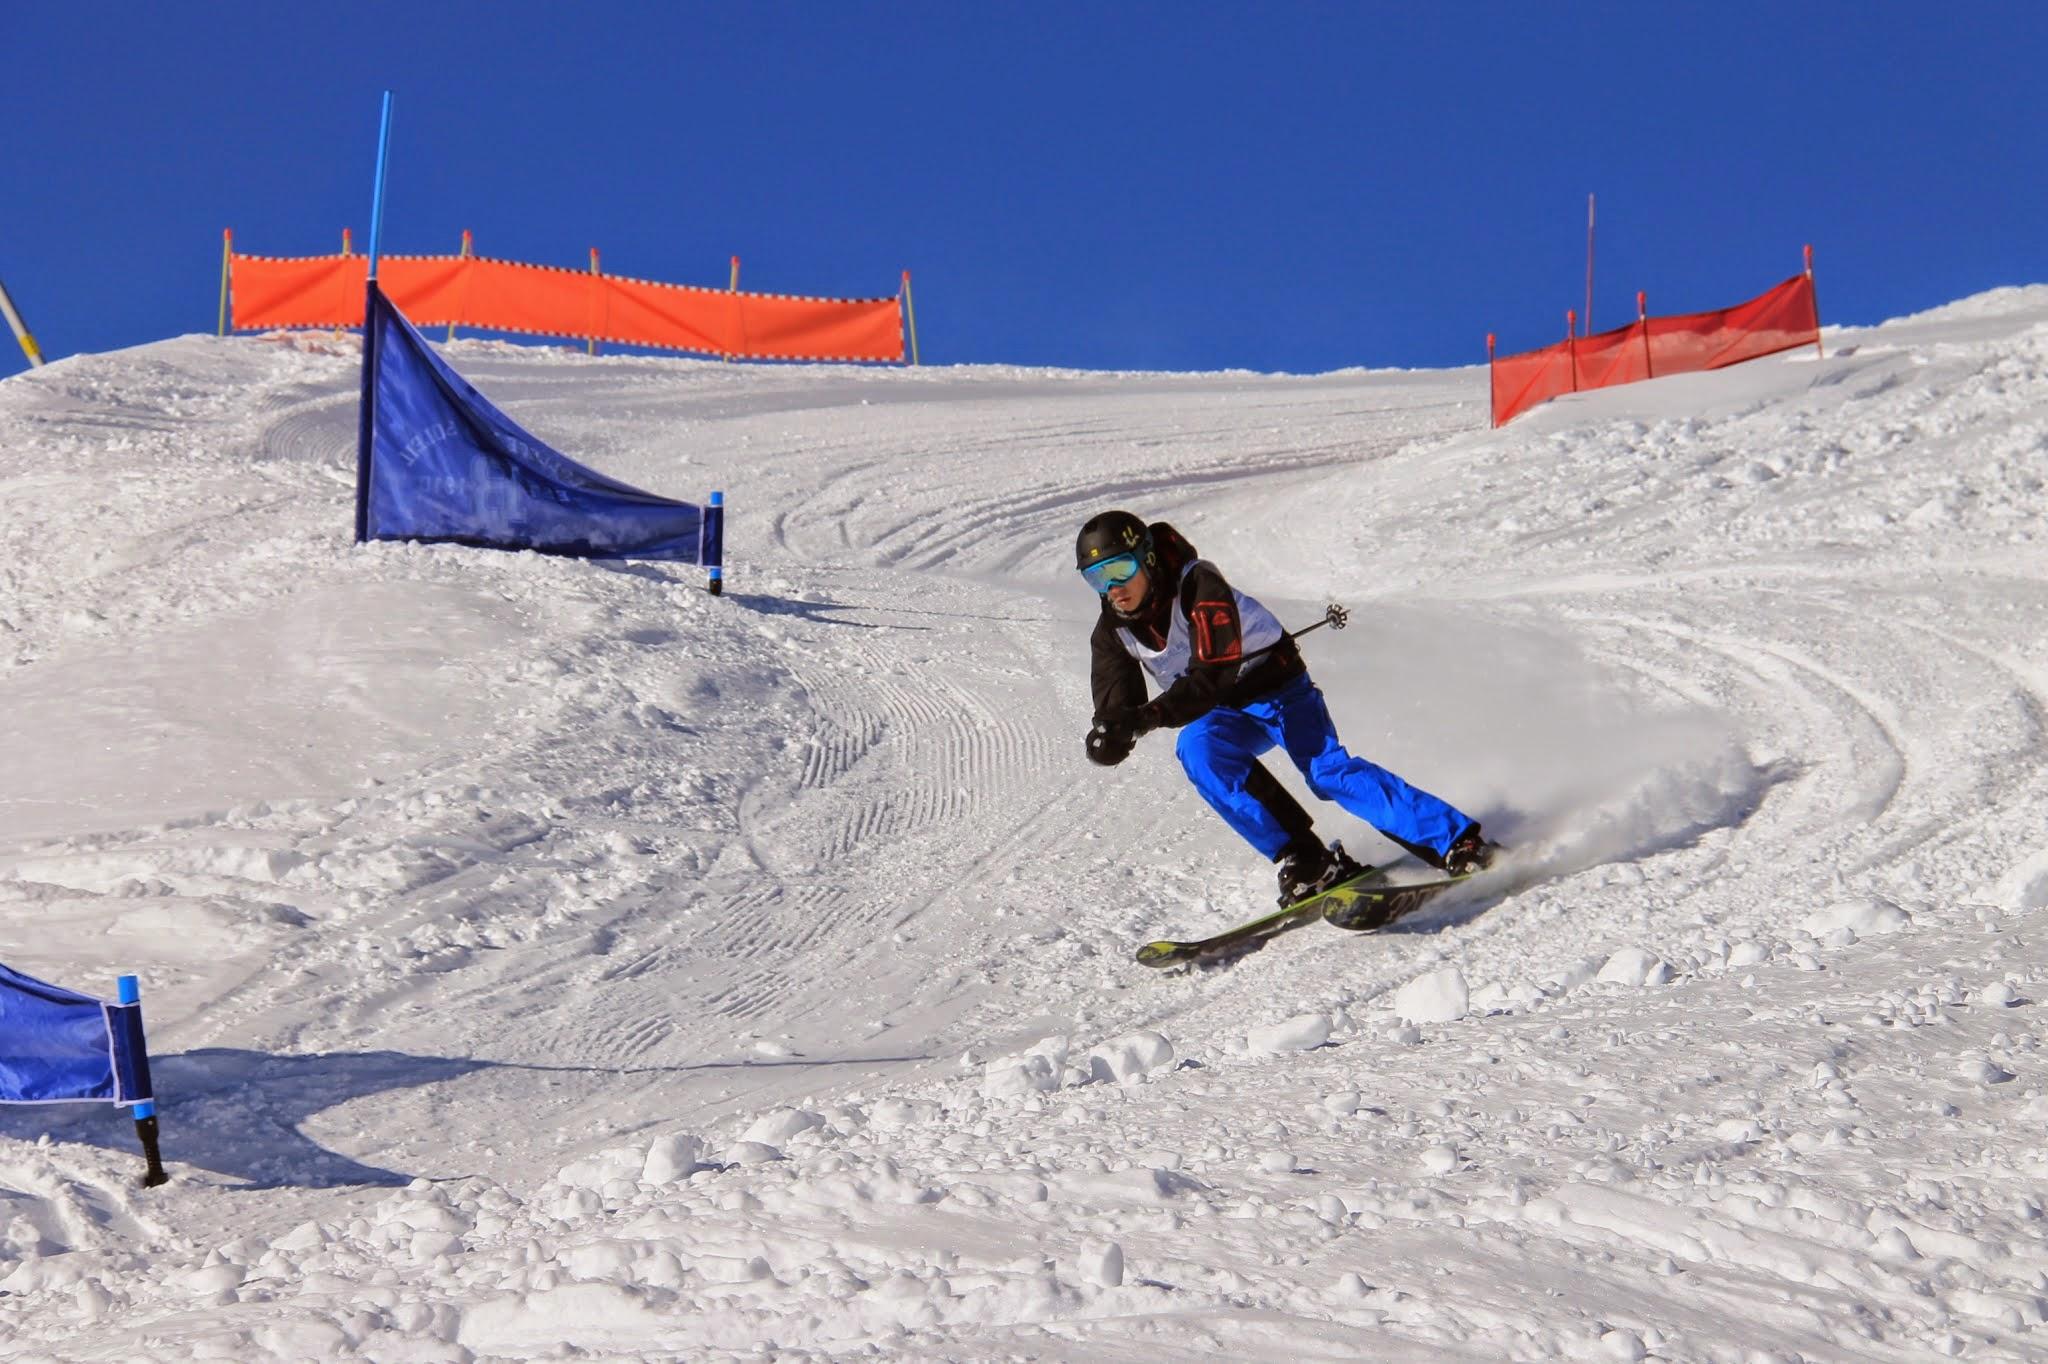 SGIS Freestyle Ski and Board Champs